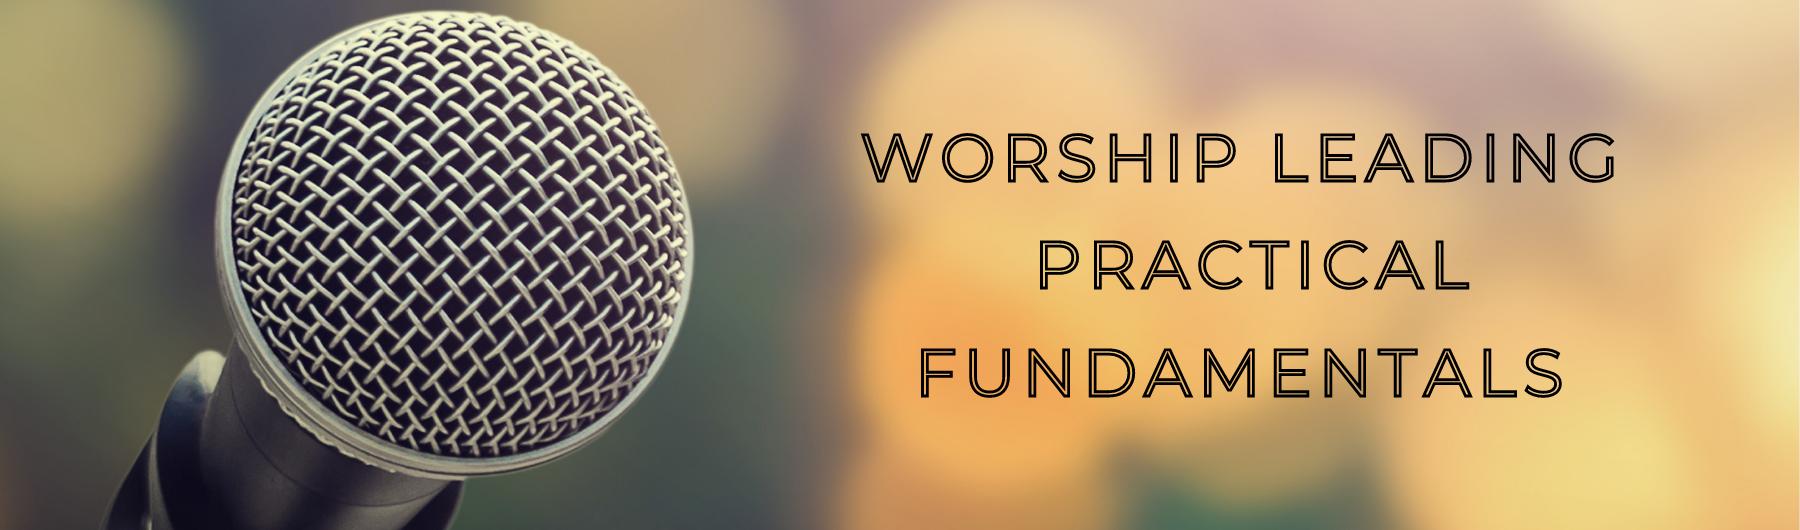 Worship Leading Practical Fundamentals